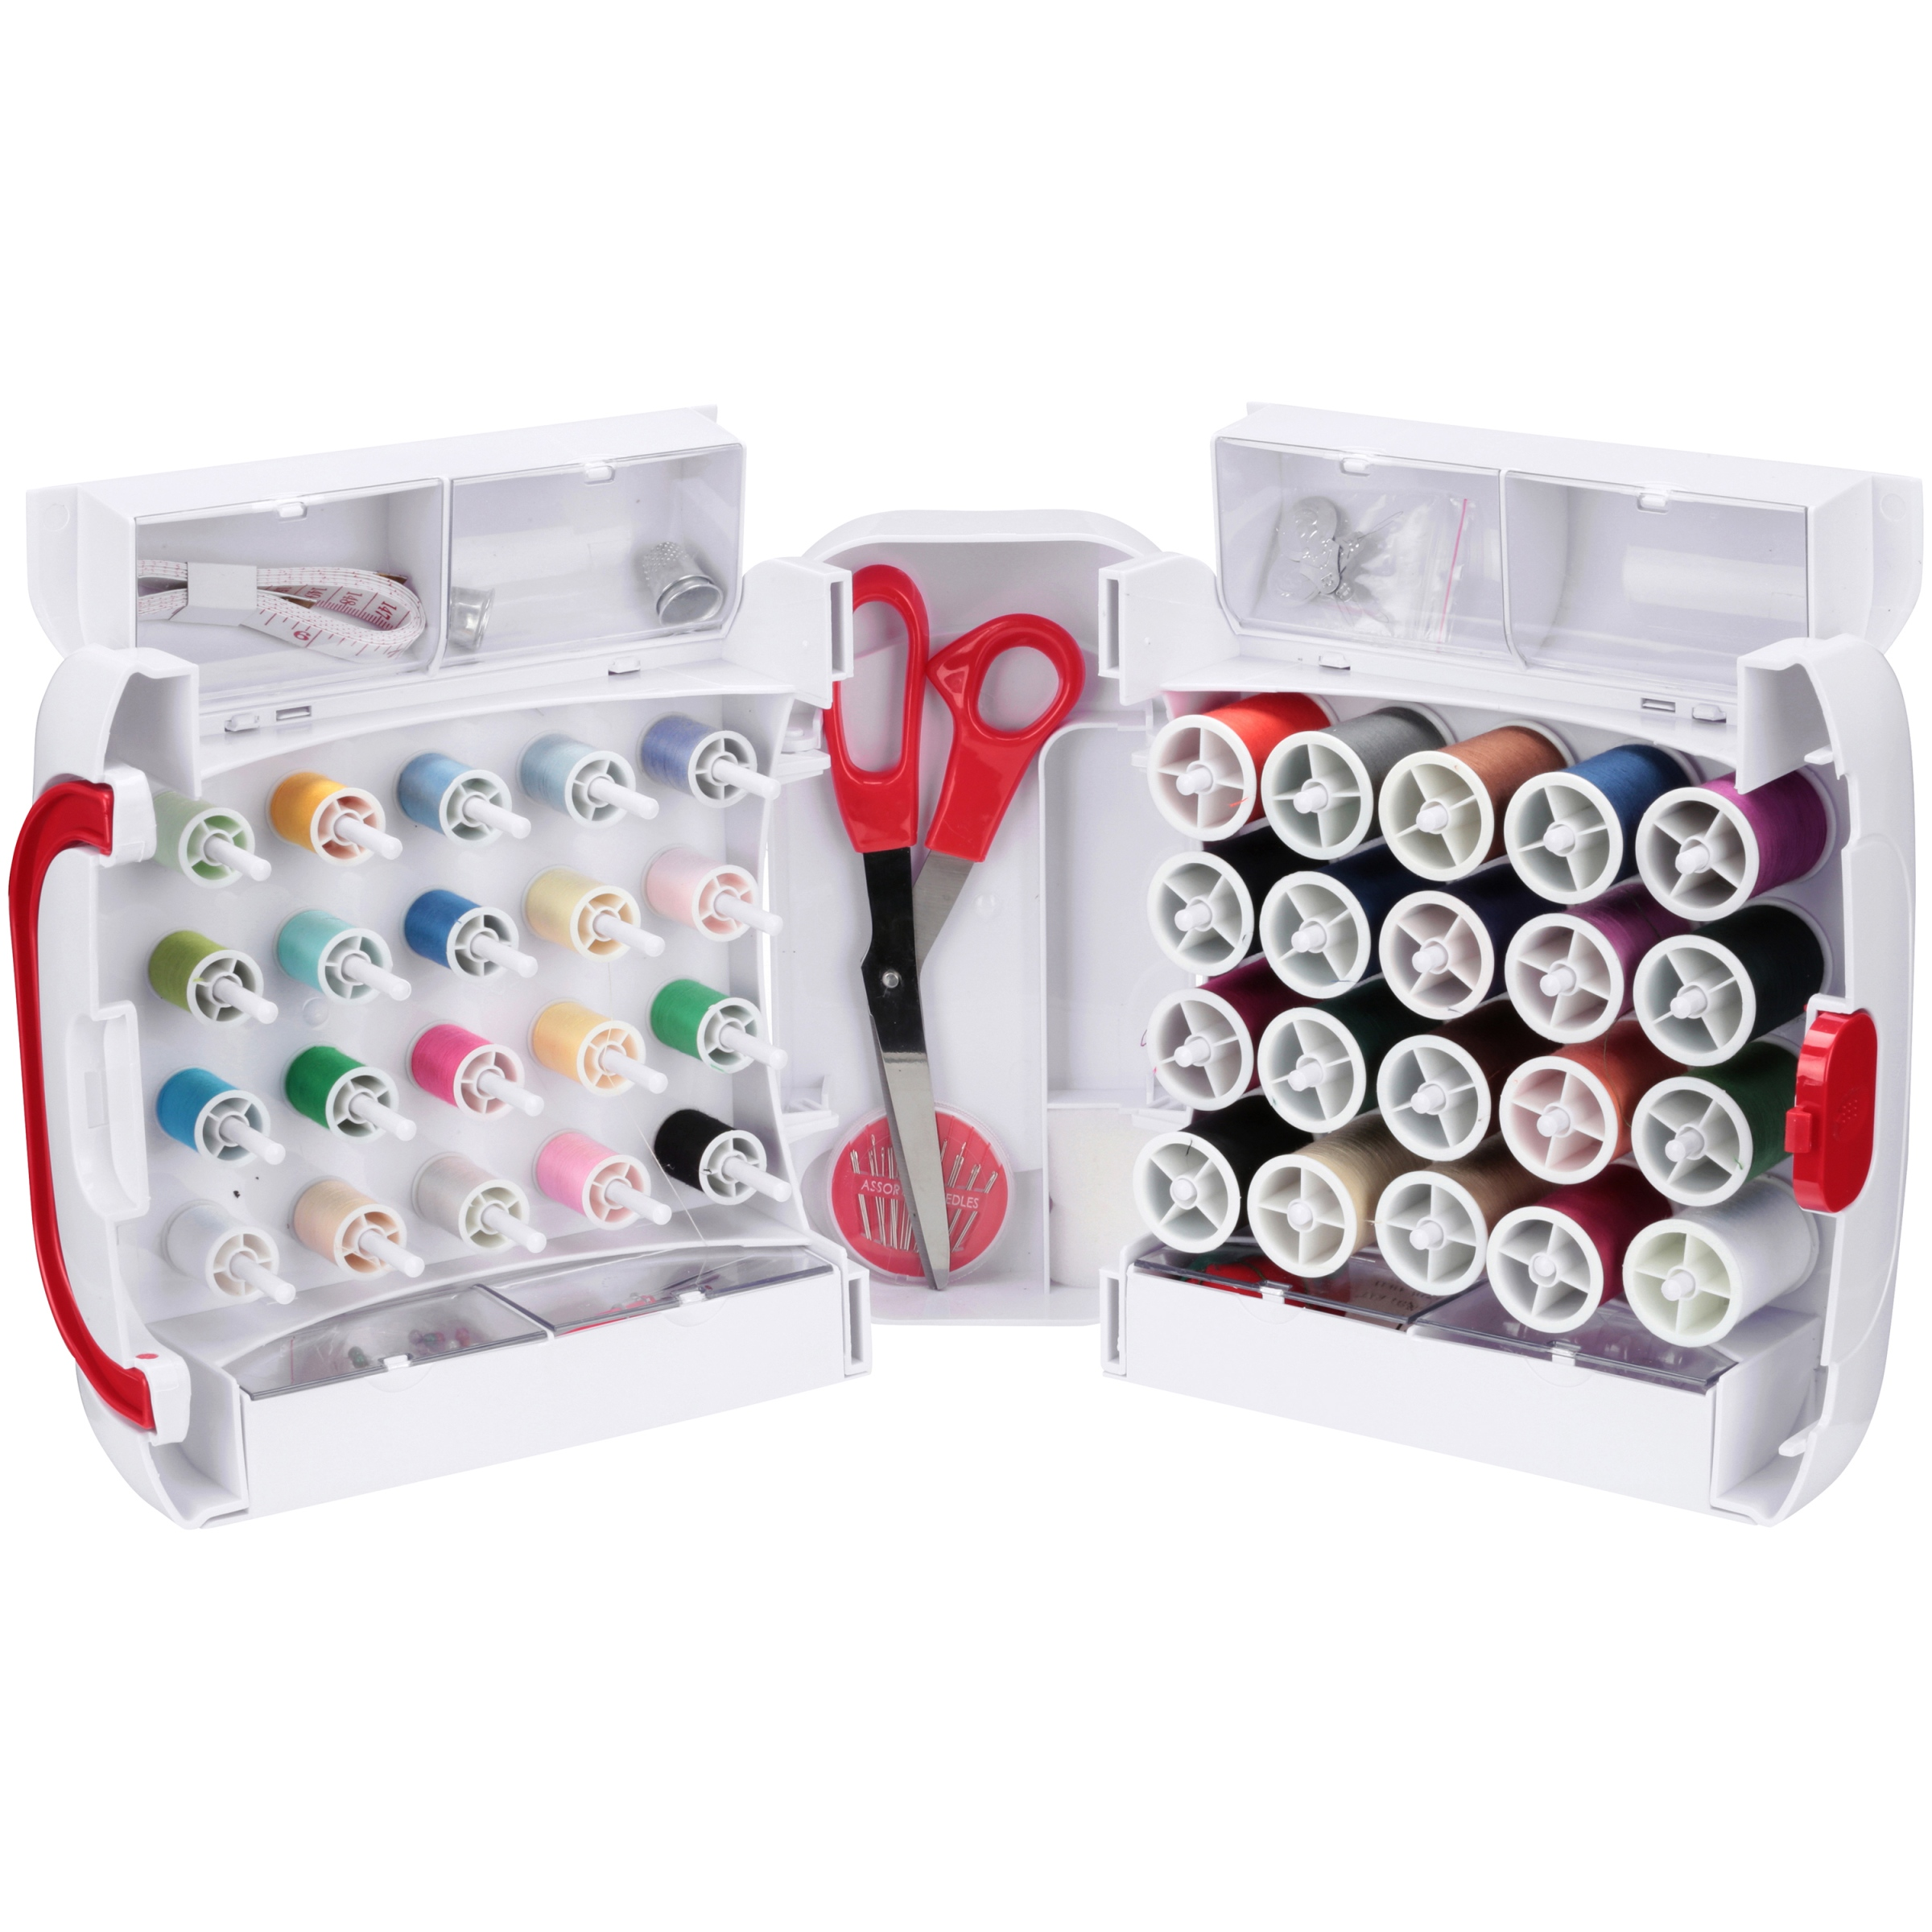 Singer® 166 Sew Essentials™ Sewing Kit 166 pc Box